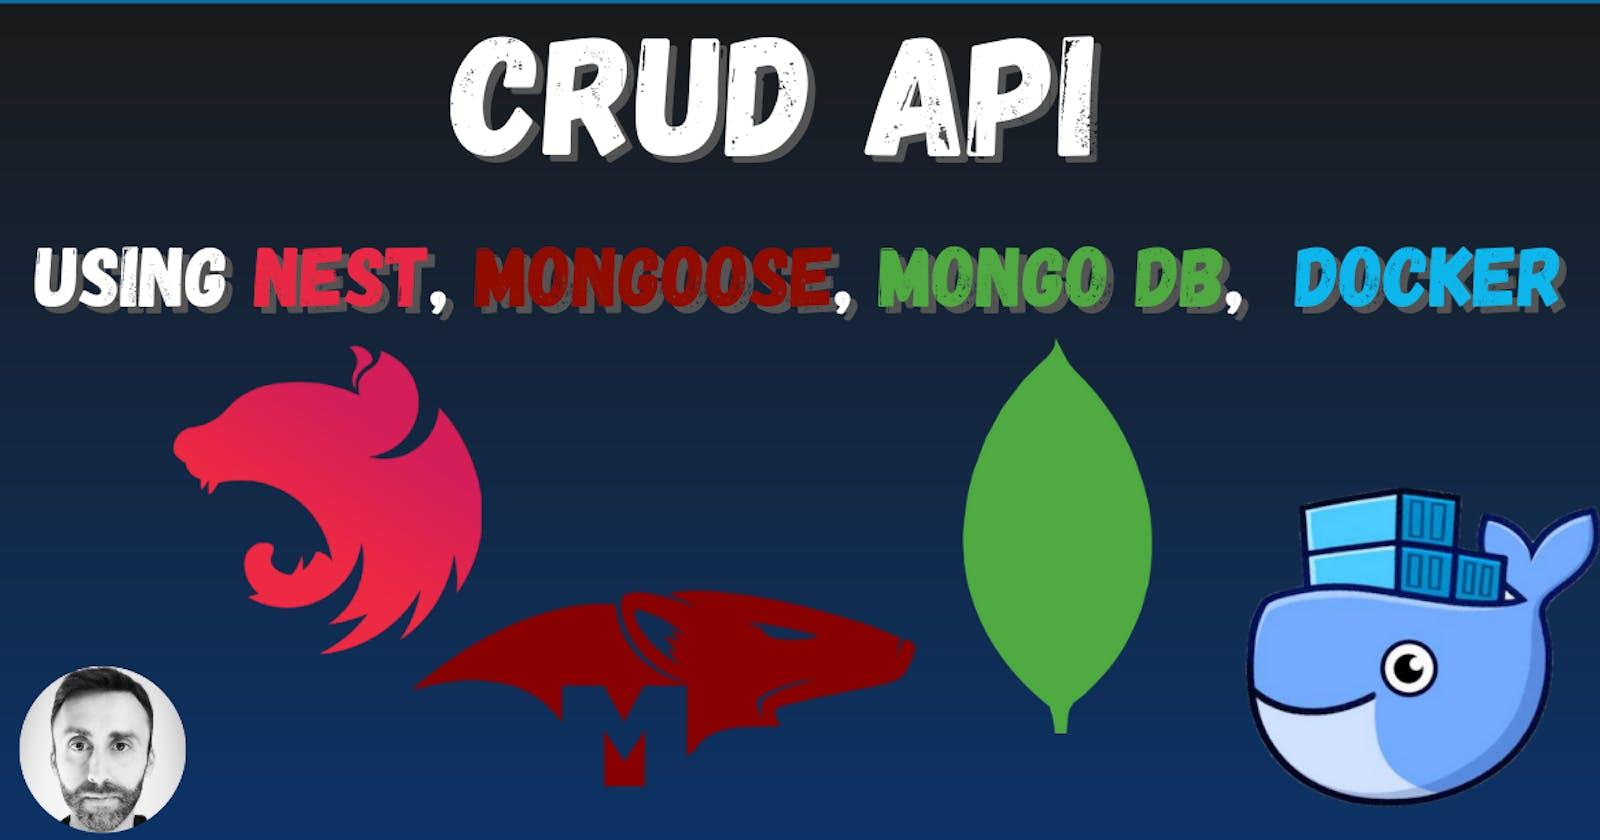 CRUD API using NestJS, Mongoose,  MongoDB and Docker